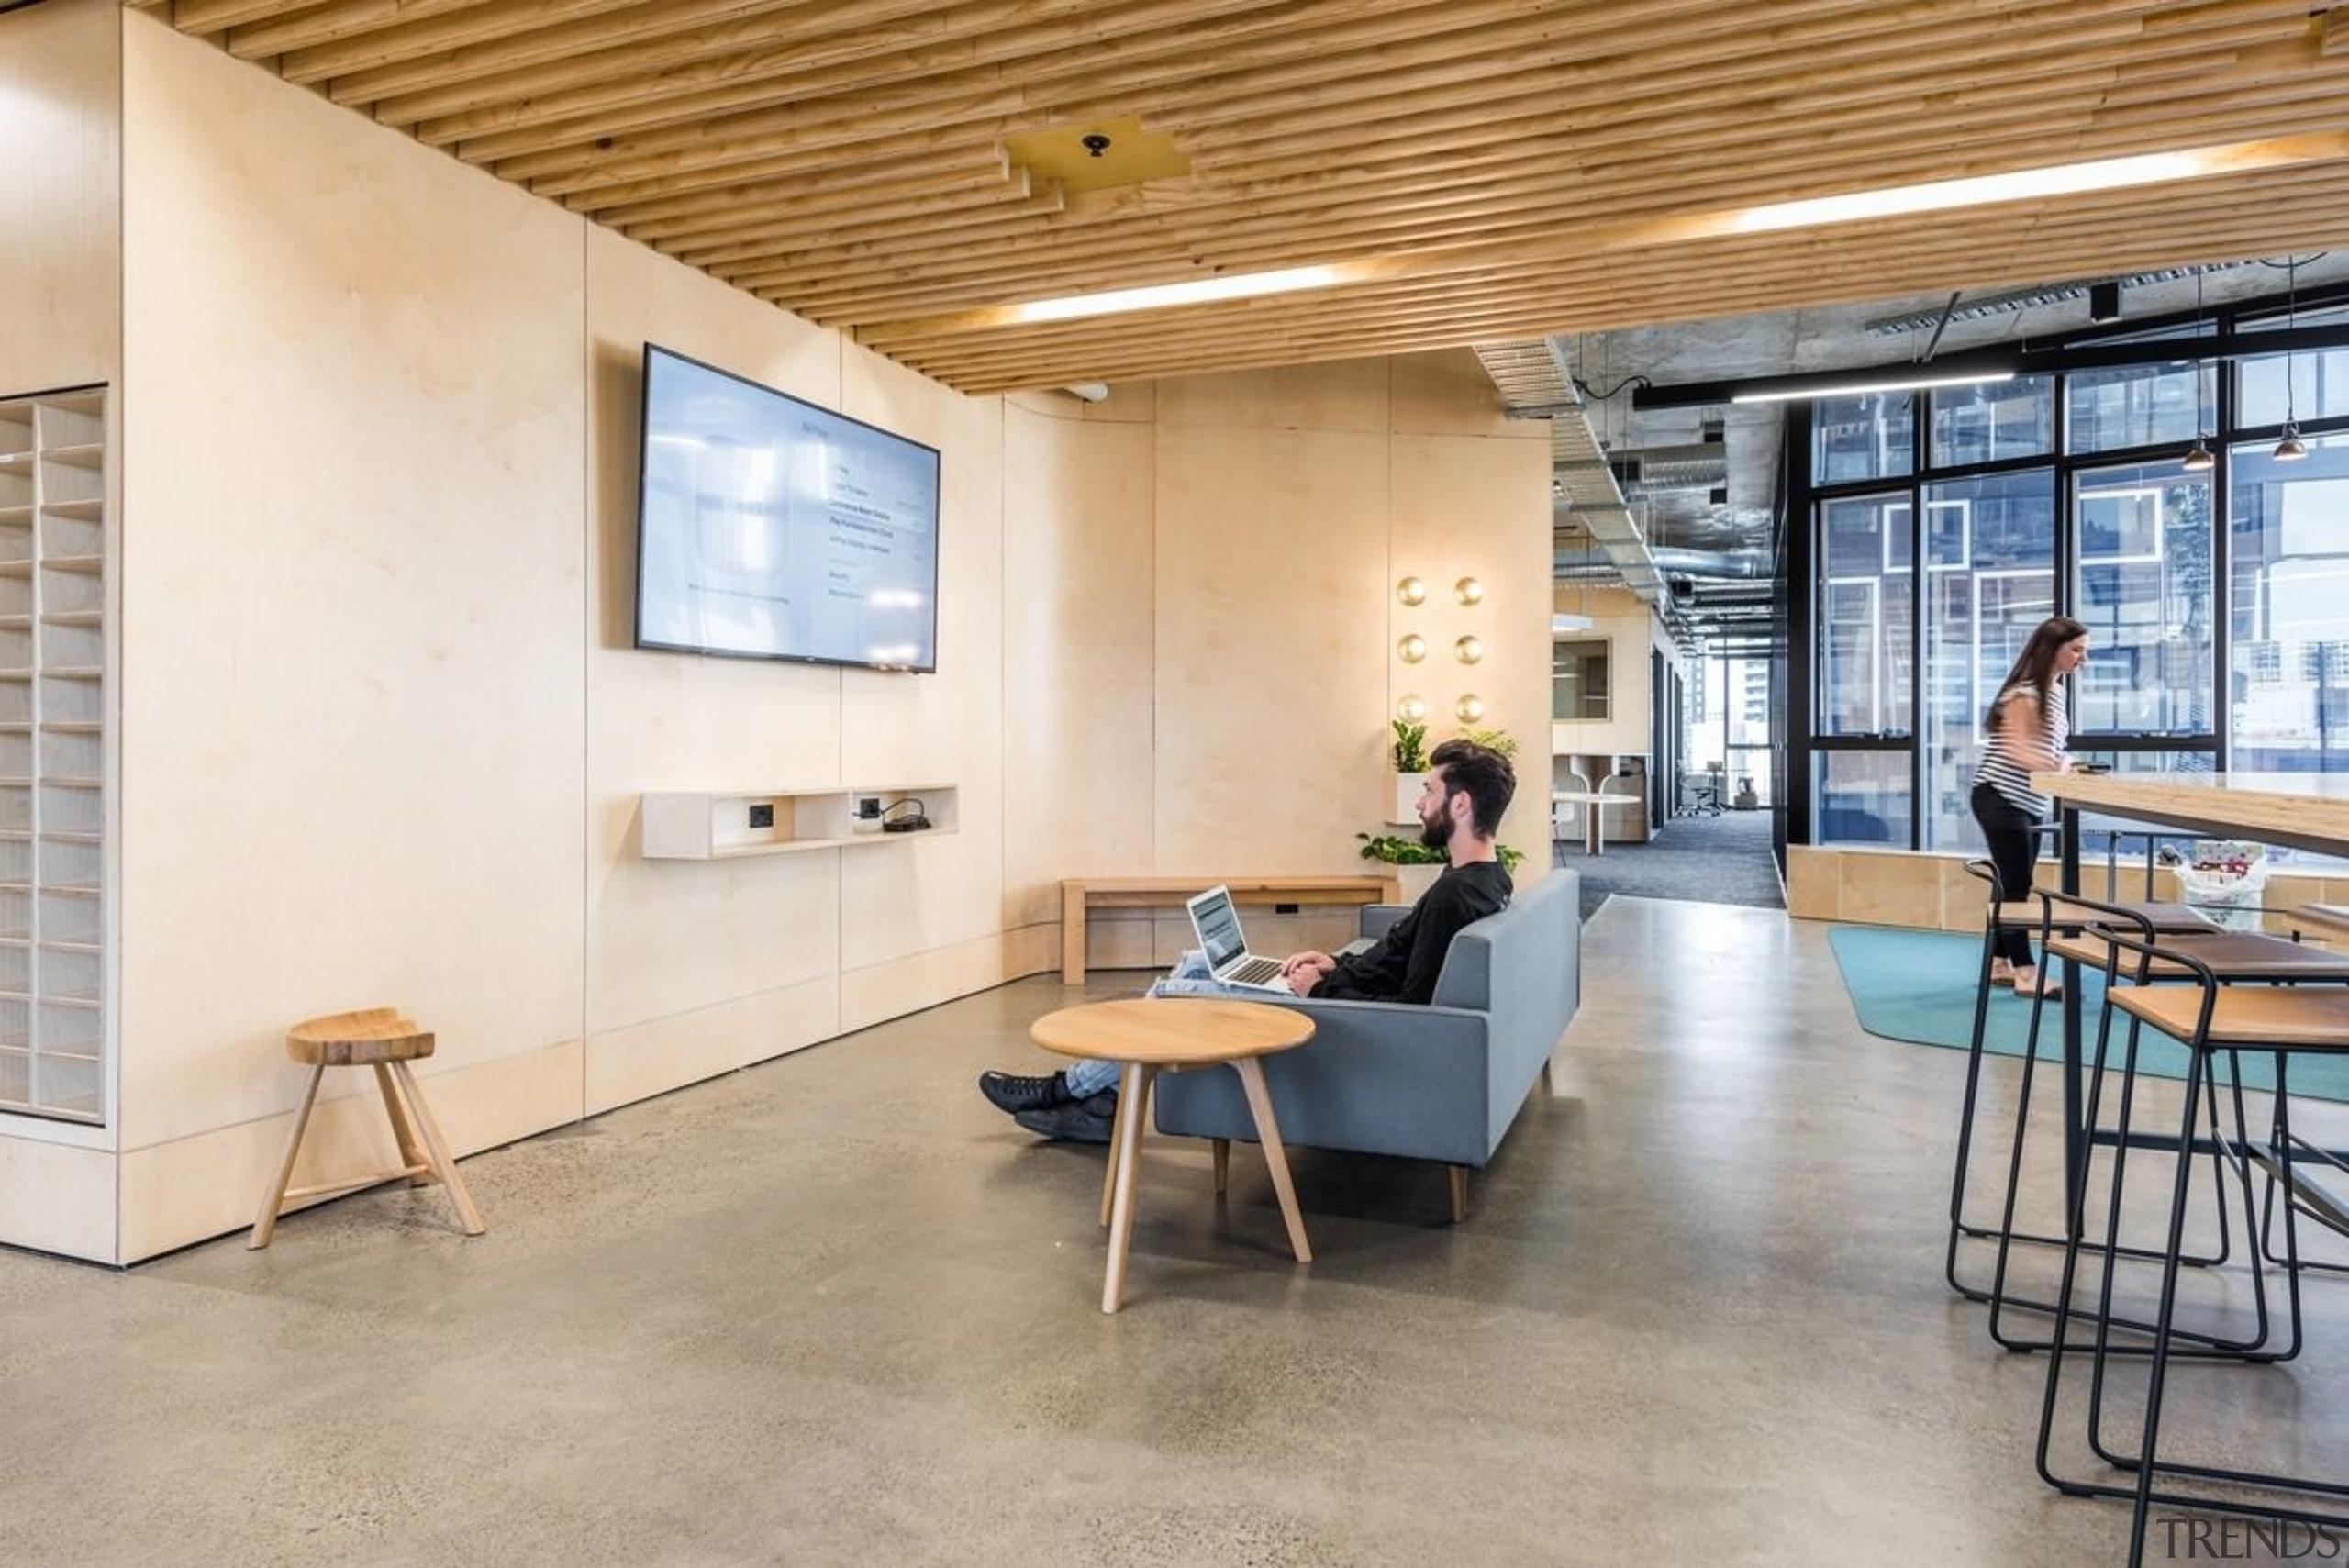 Designed by: Siren Design GroupPhotography by Cheyne architecture, ceiling, daylighting, floor, flooring, furniture, interior design, loft, table, gray